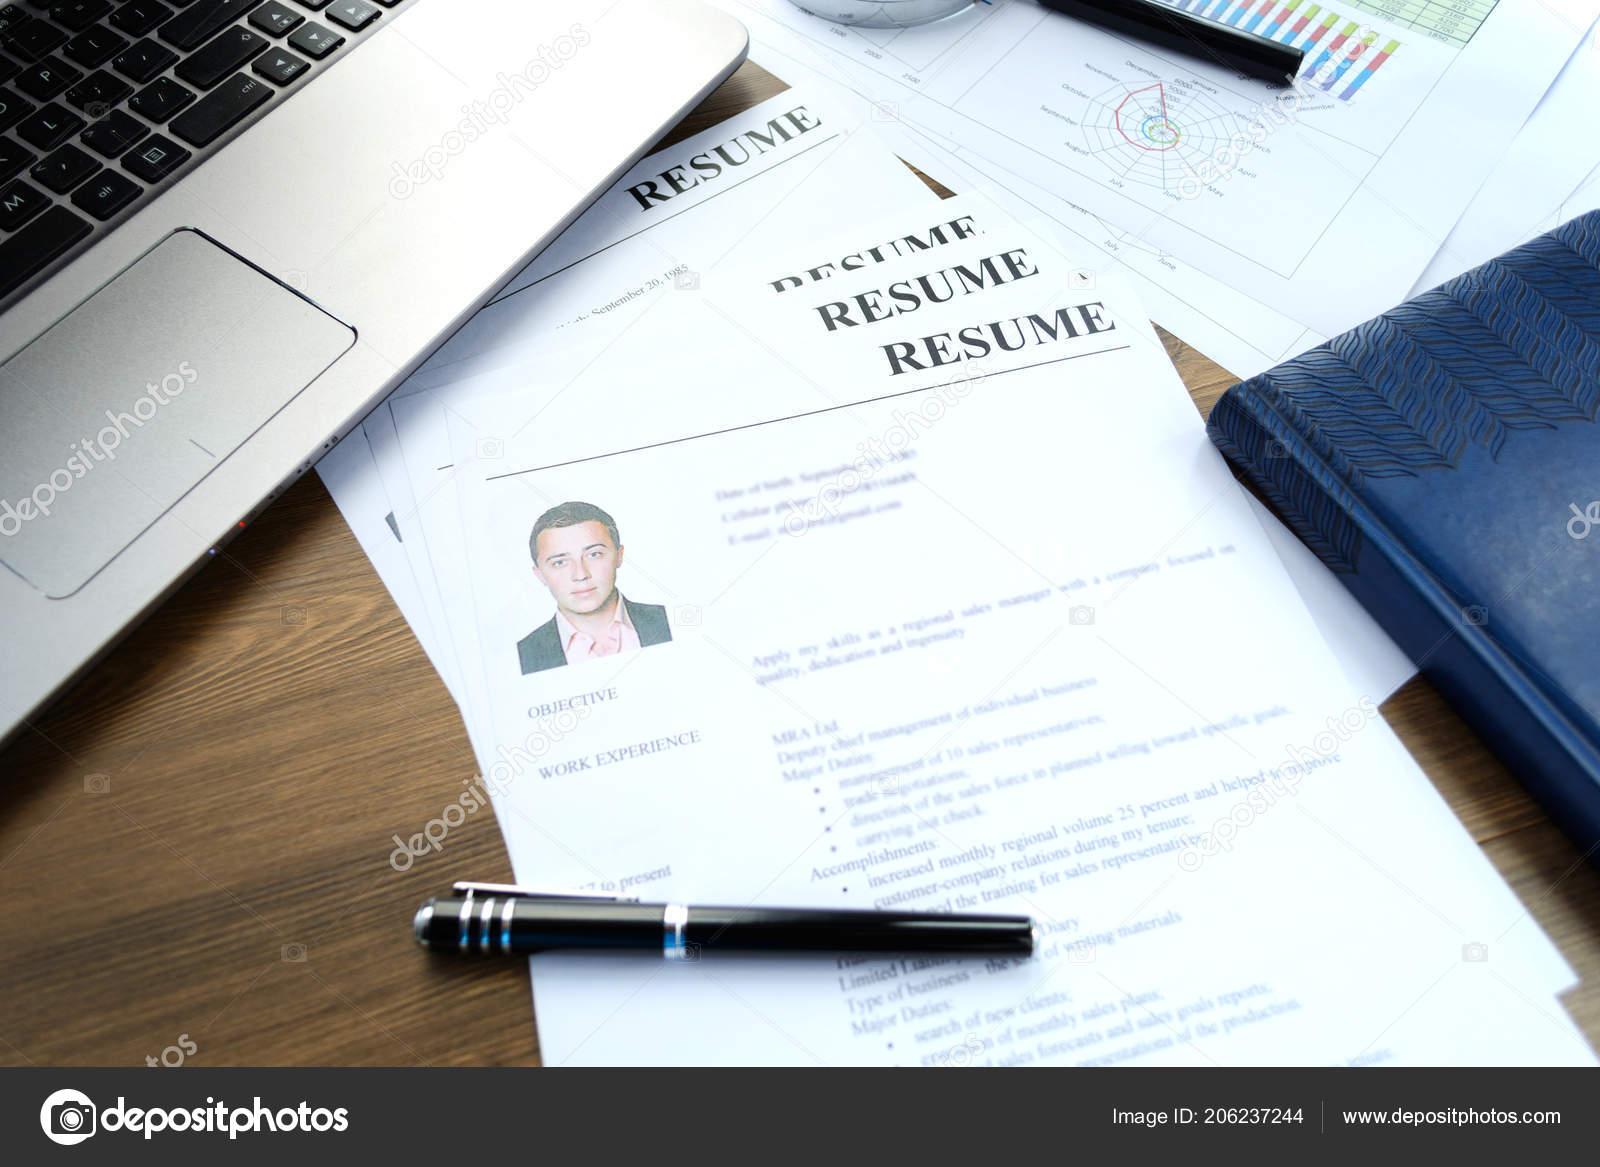 Resume Curriculum Vitae Pen Written Wooden Table Stock Photo